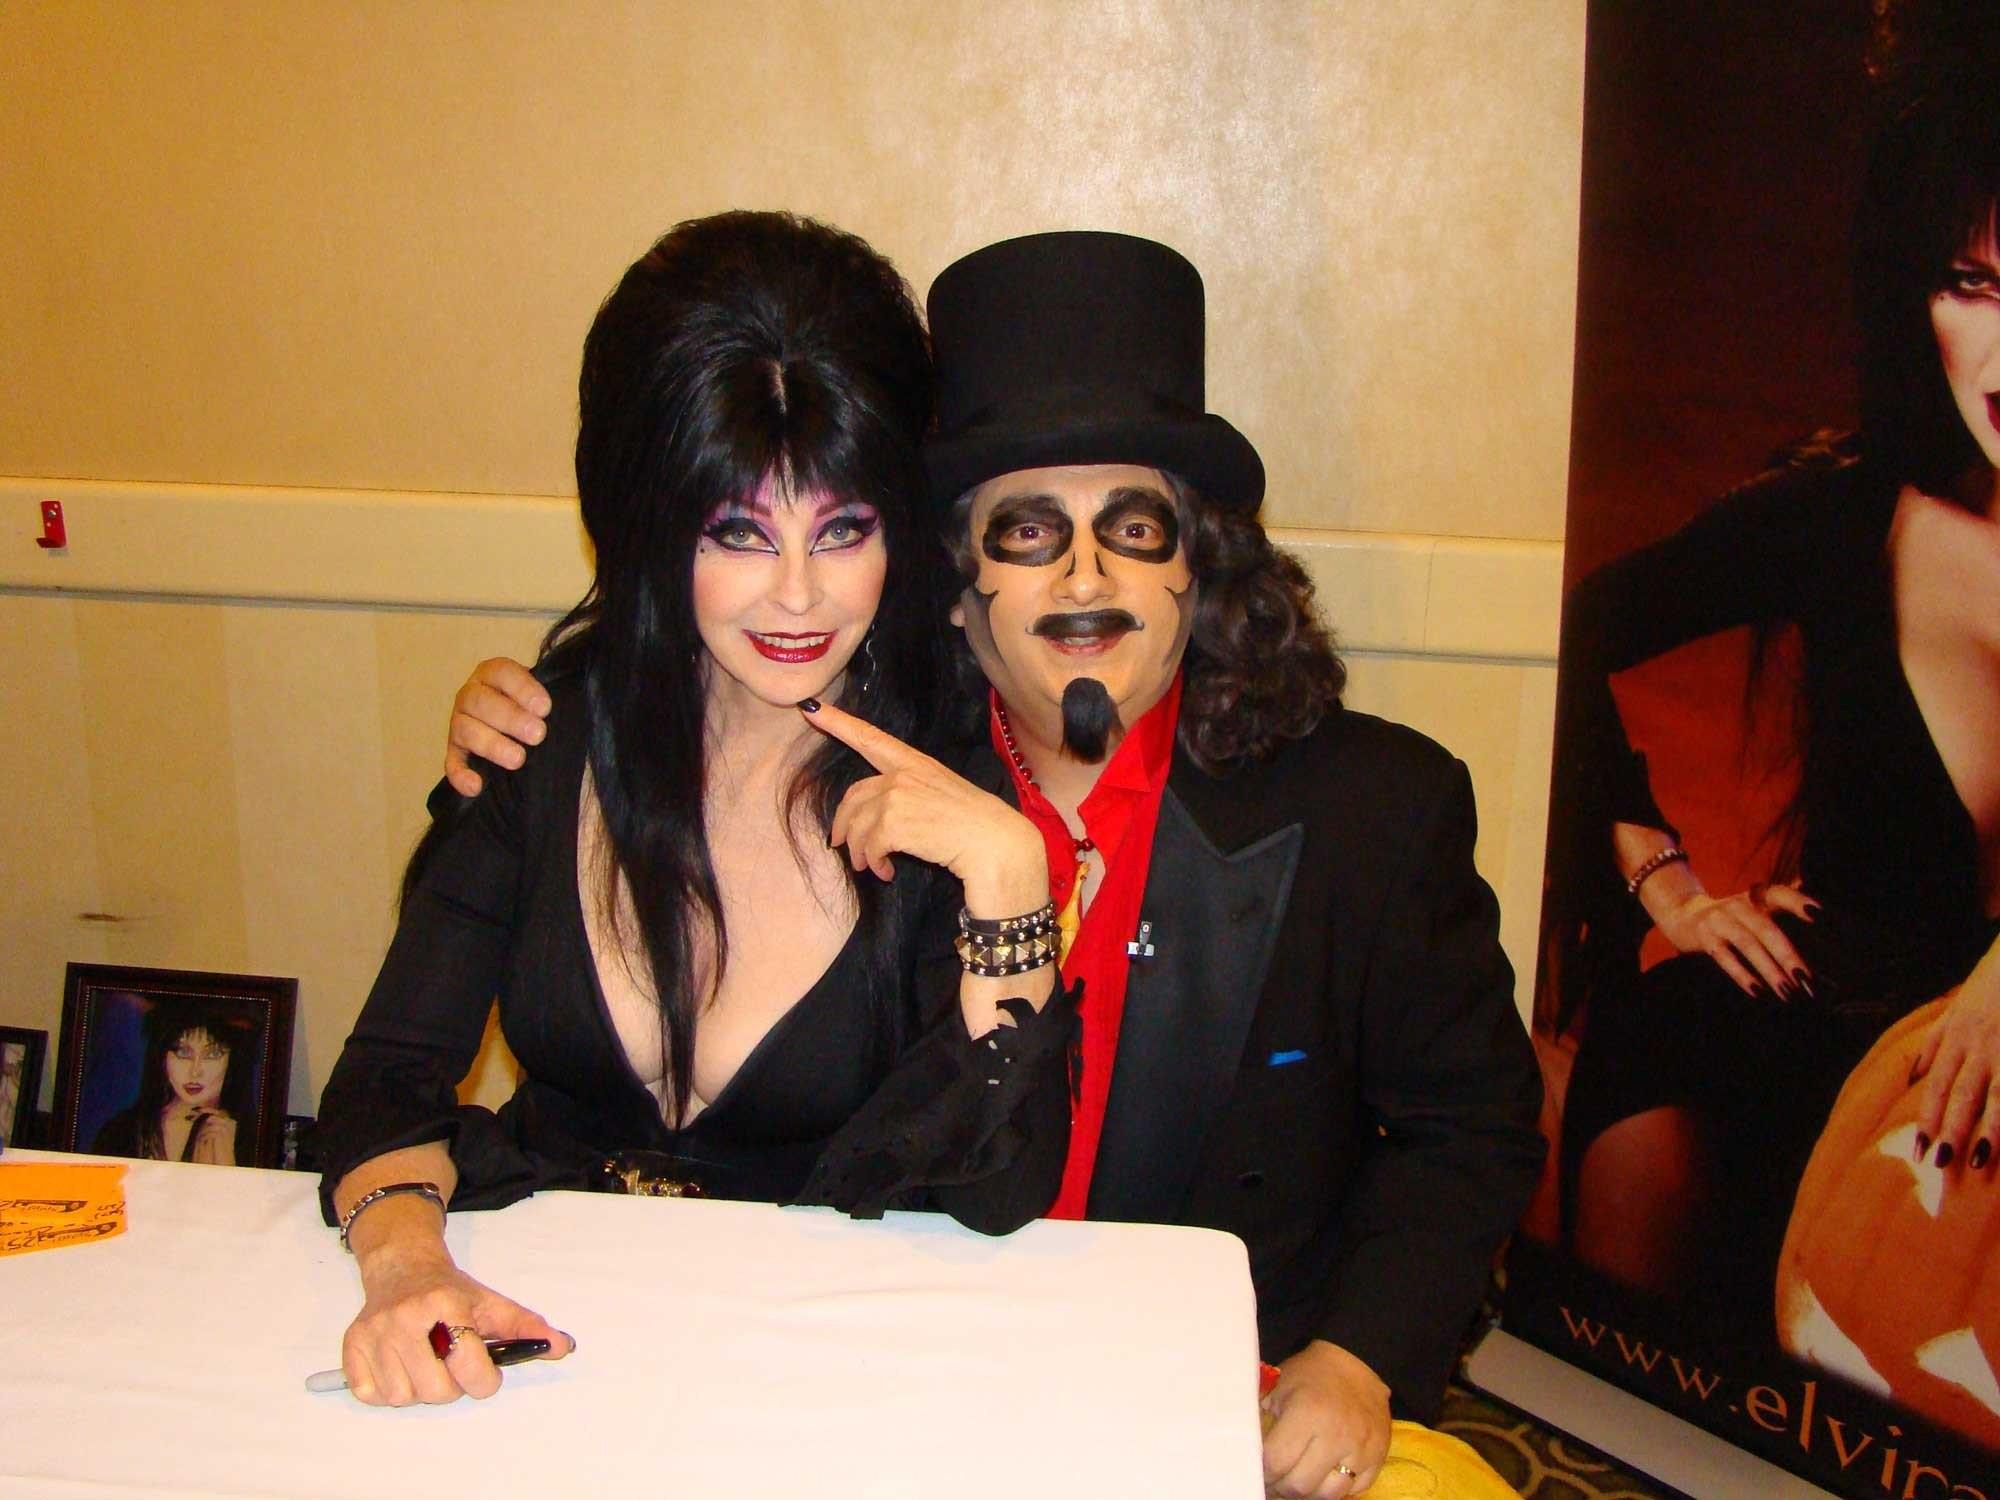 Television Horror Host Icons: Elvira, Mistress of the Dark and Svengoolie